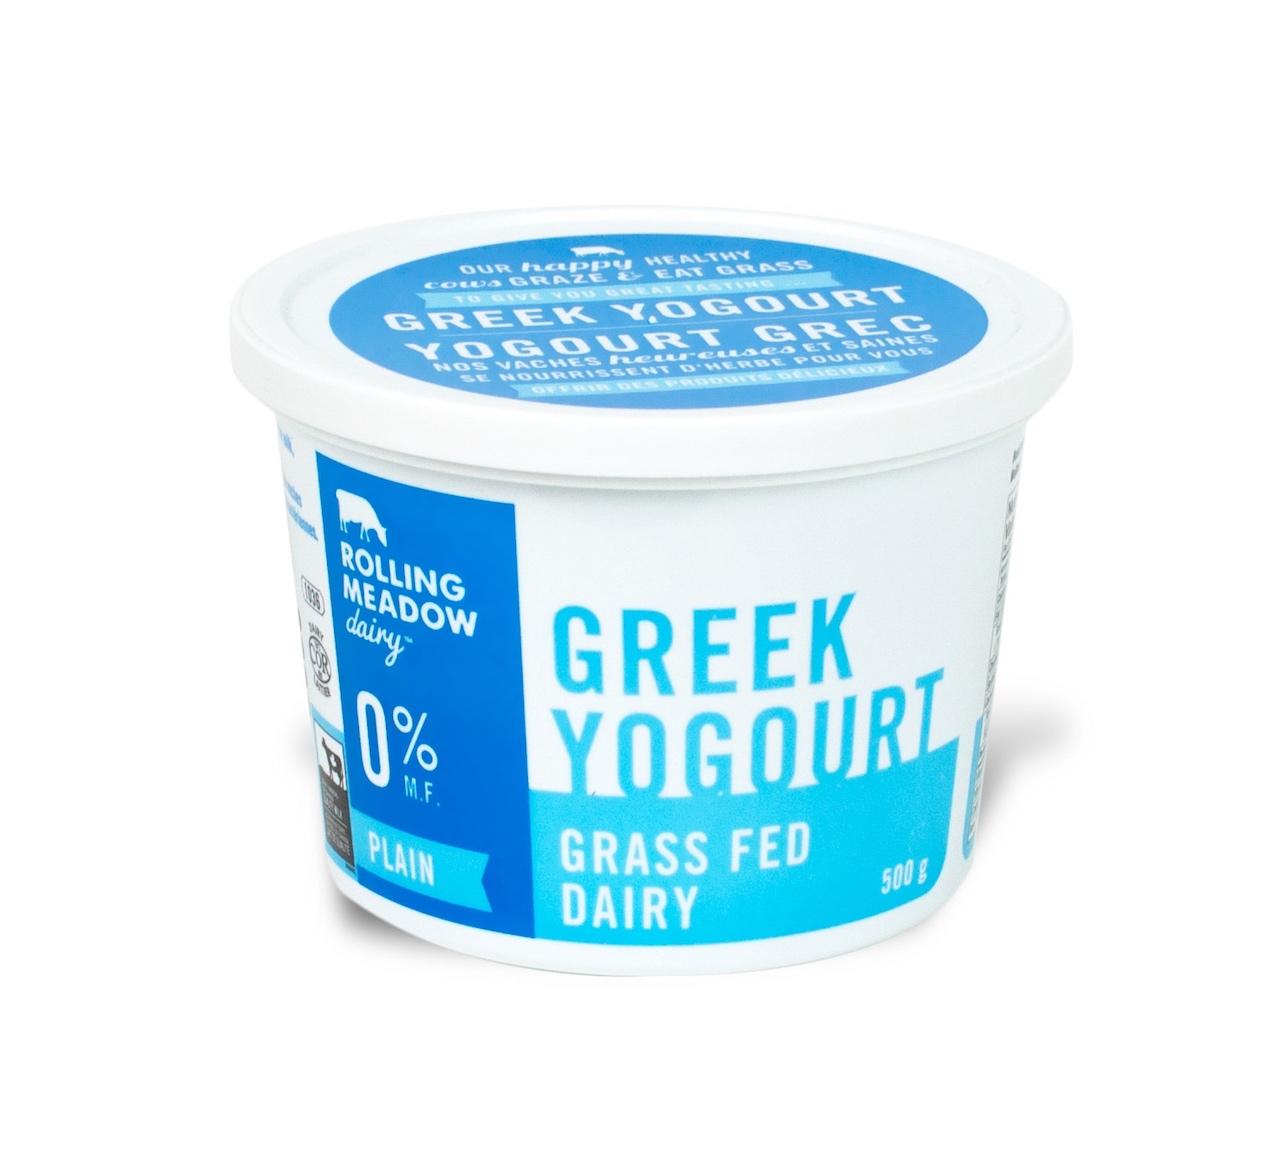 0% Plain Greek Yogourt